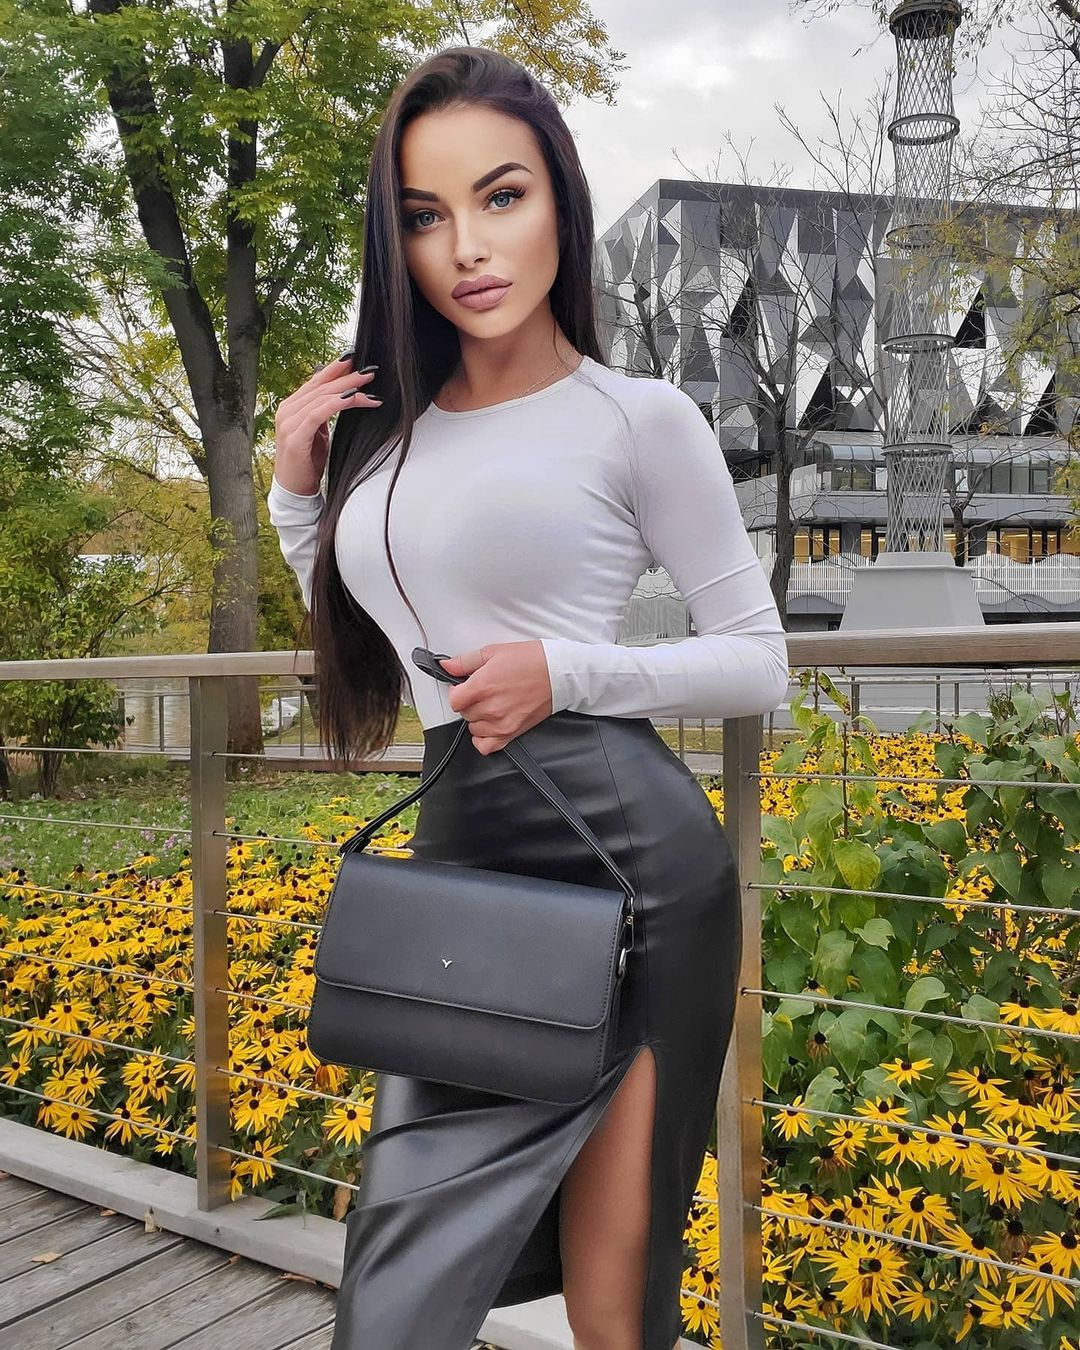 Aleksandra-Dontsu-Wallpapers-Insta-Fit-Bio-5